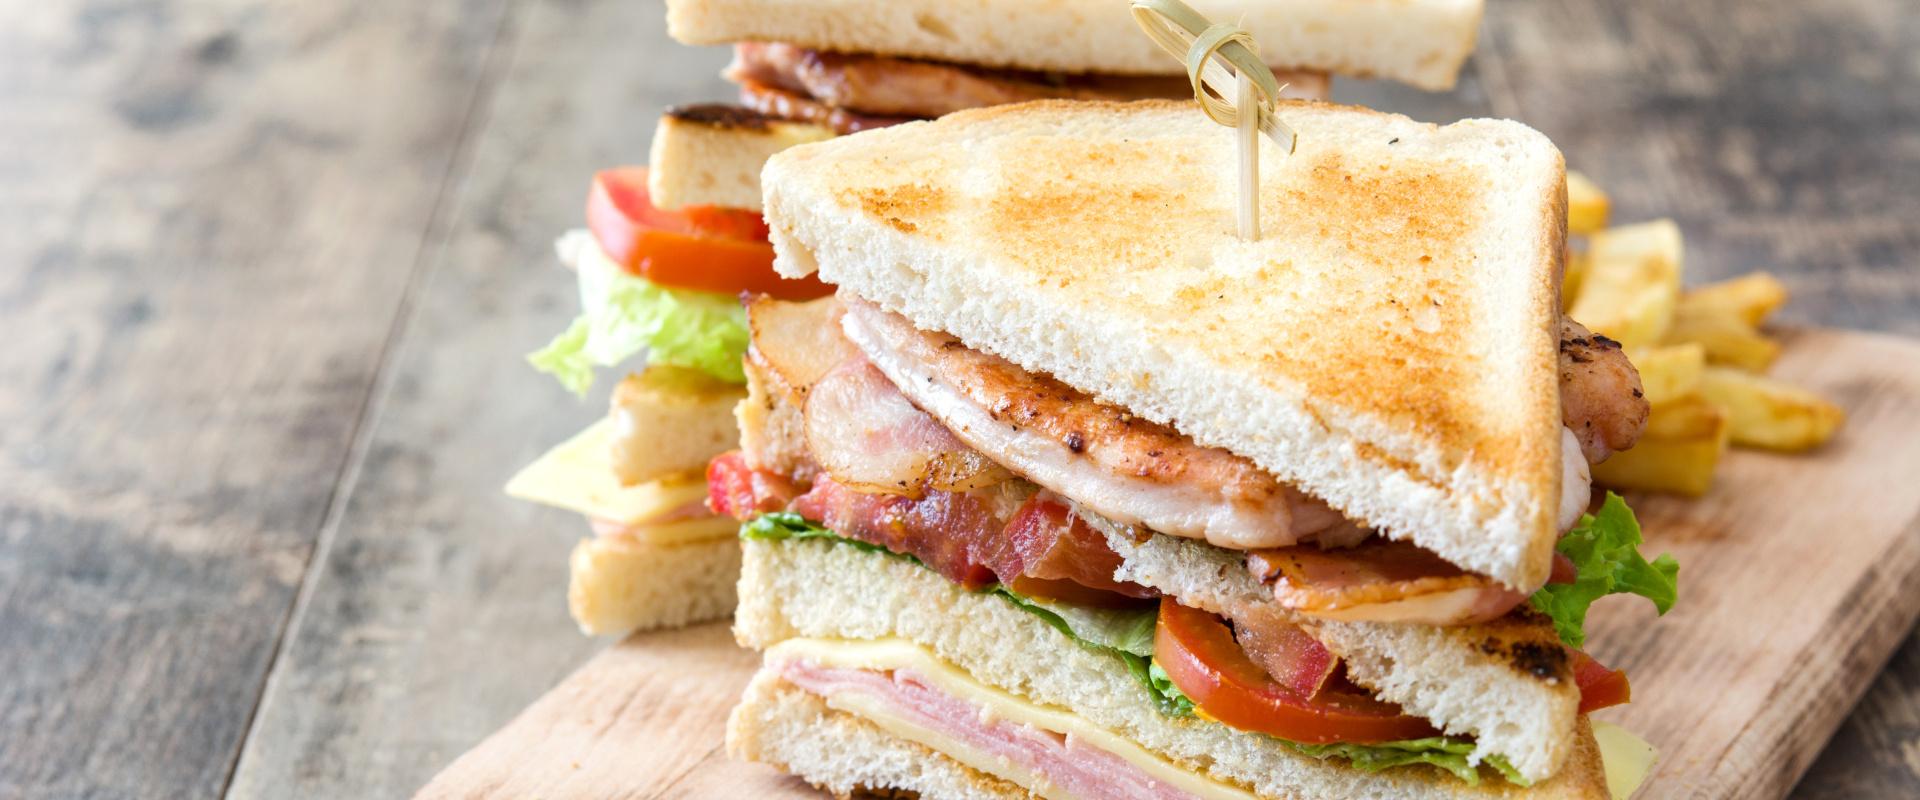 klub szendvics cover